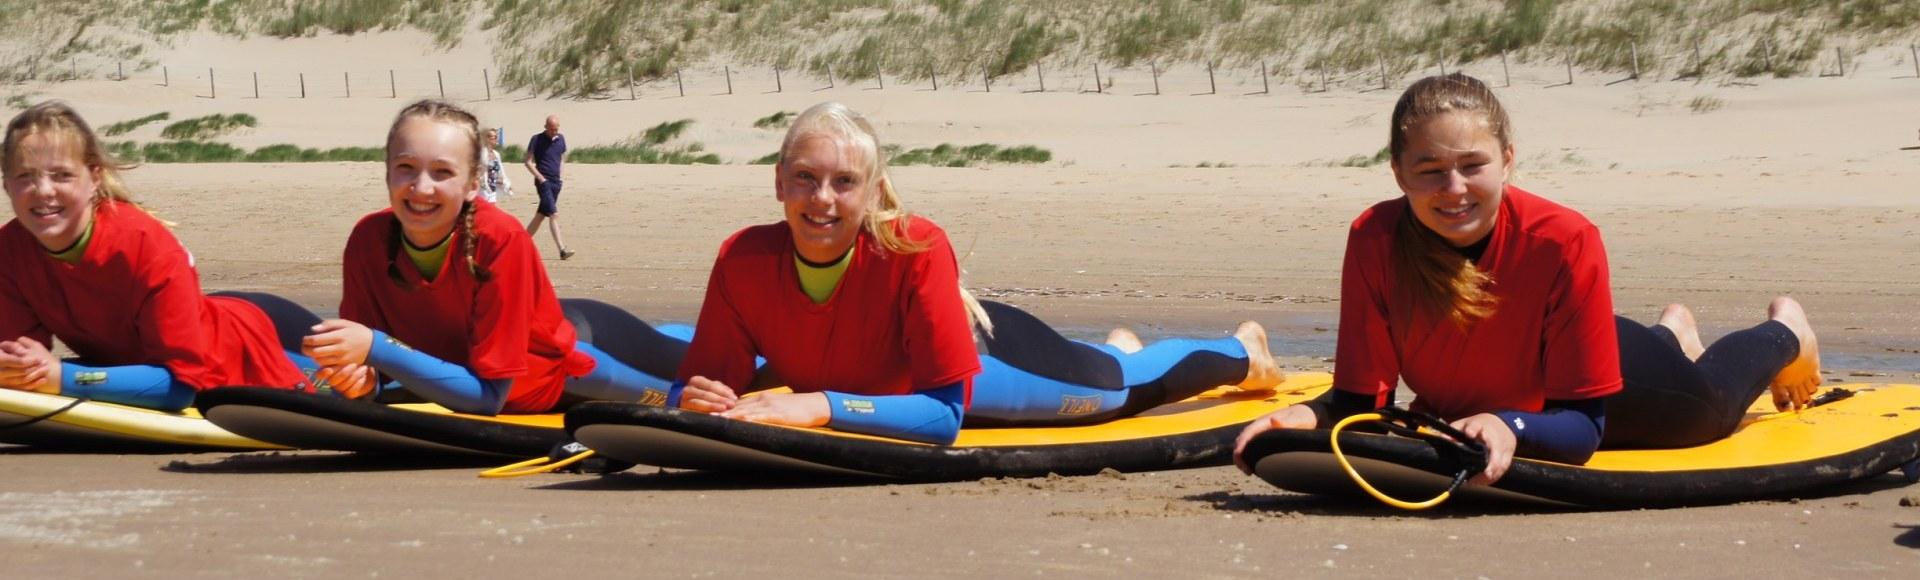 Surfplank stalling Bloemendaal aan Zee